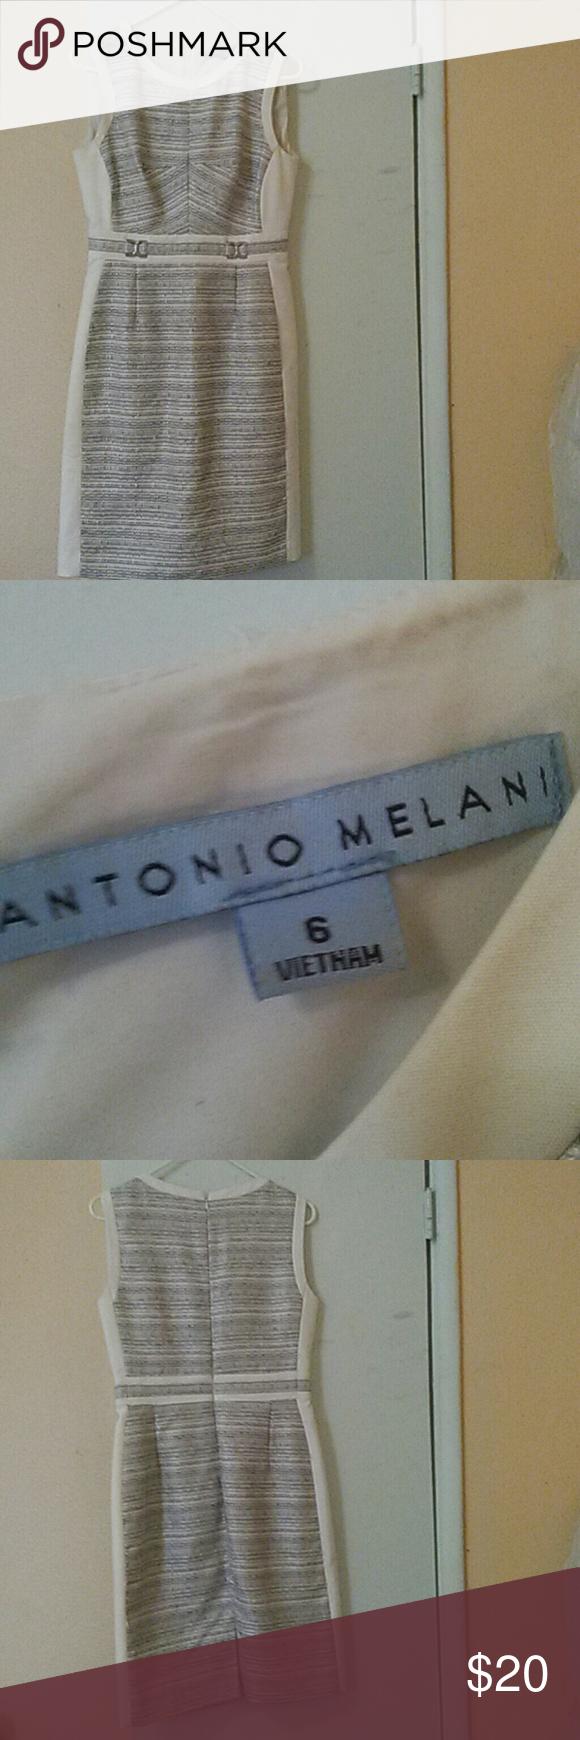 Antonio melani dresd Fair condition flaws shown in last pic ANTONIO MELANI Dresses